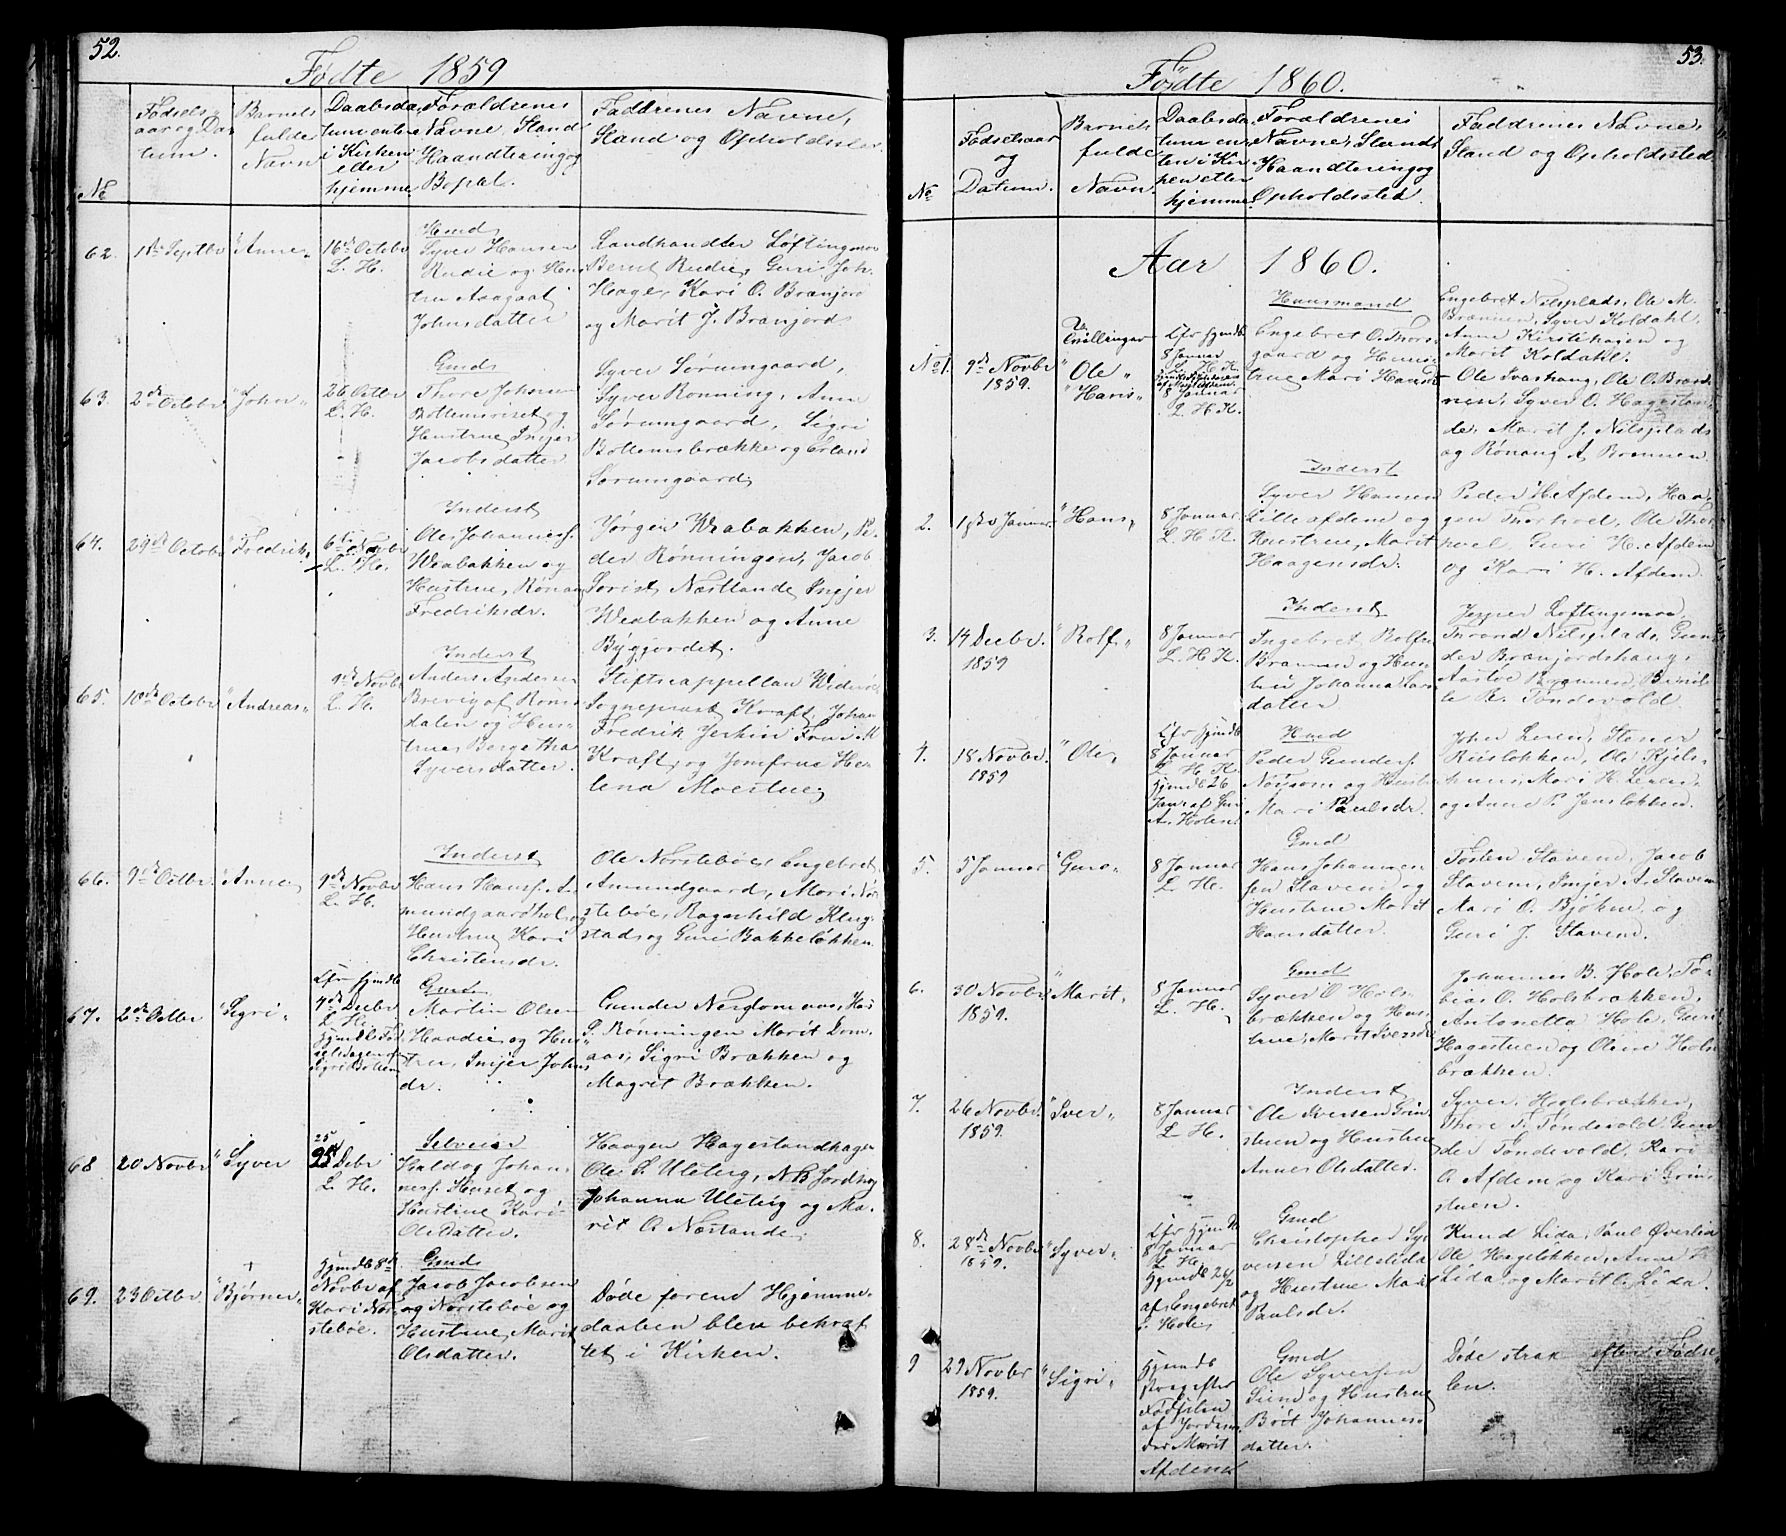 SAH, Lesja prestekontor, Klokkerbok nr. 5, 1850-1894, s. 52-53